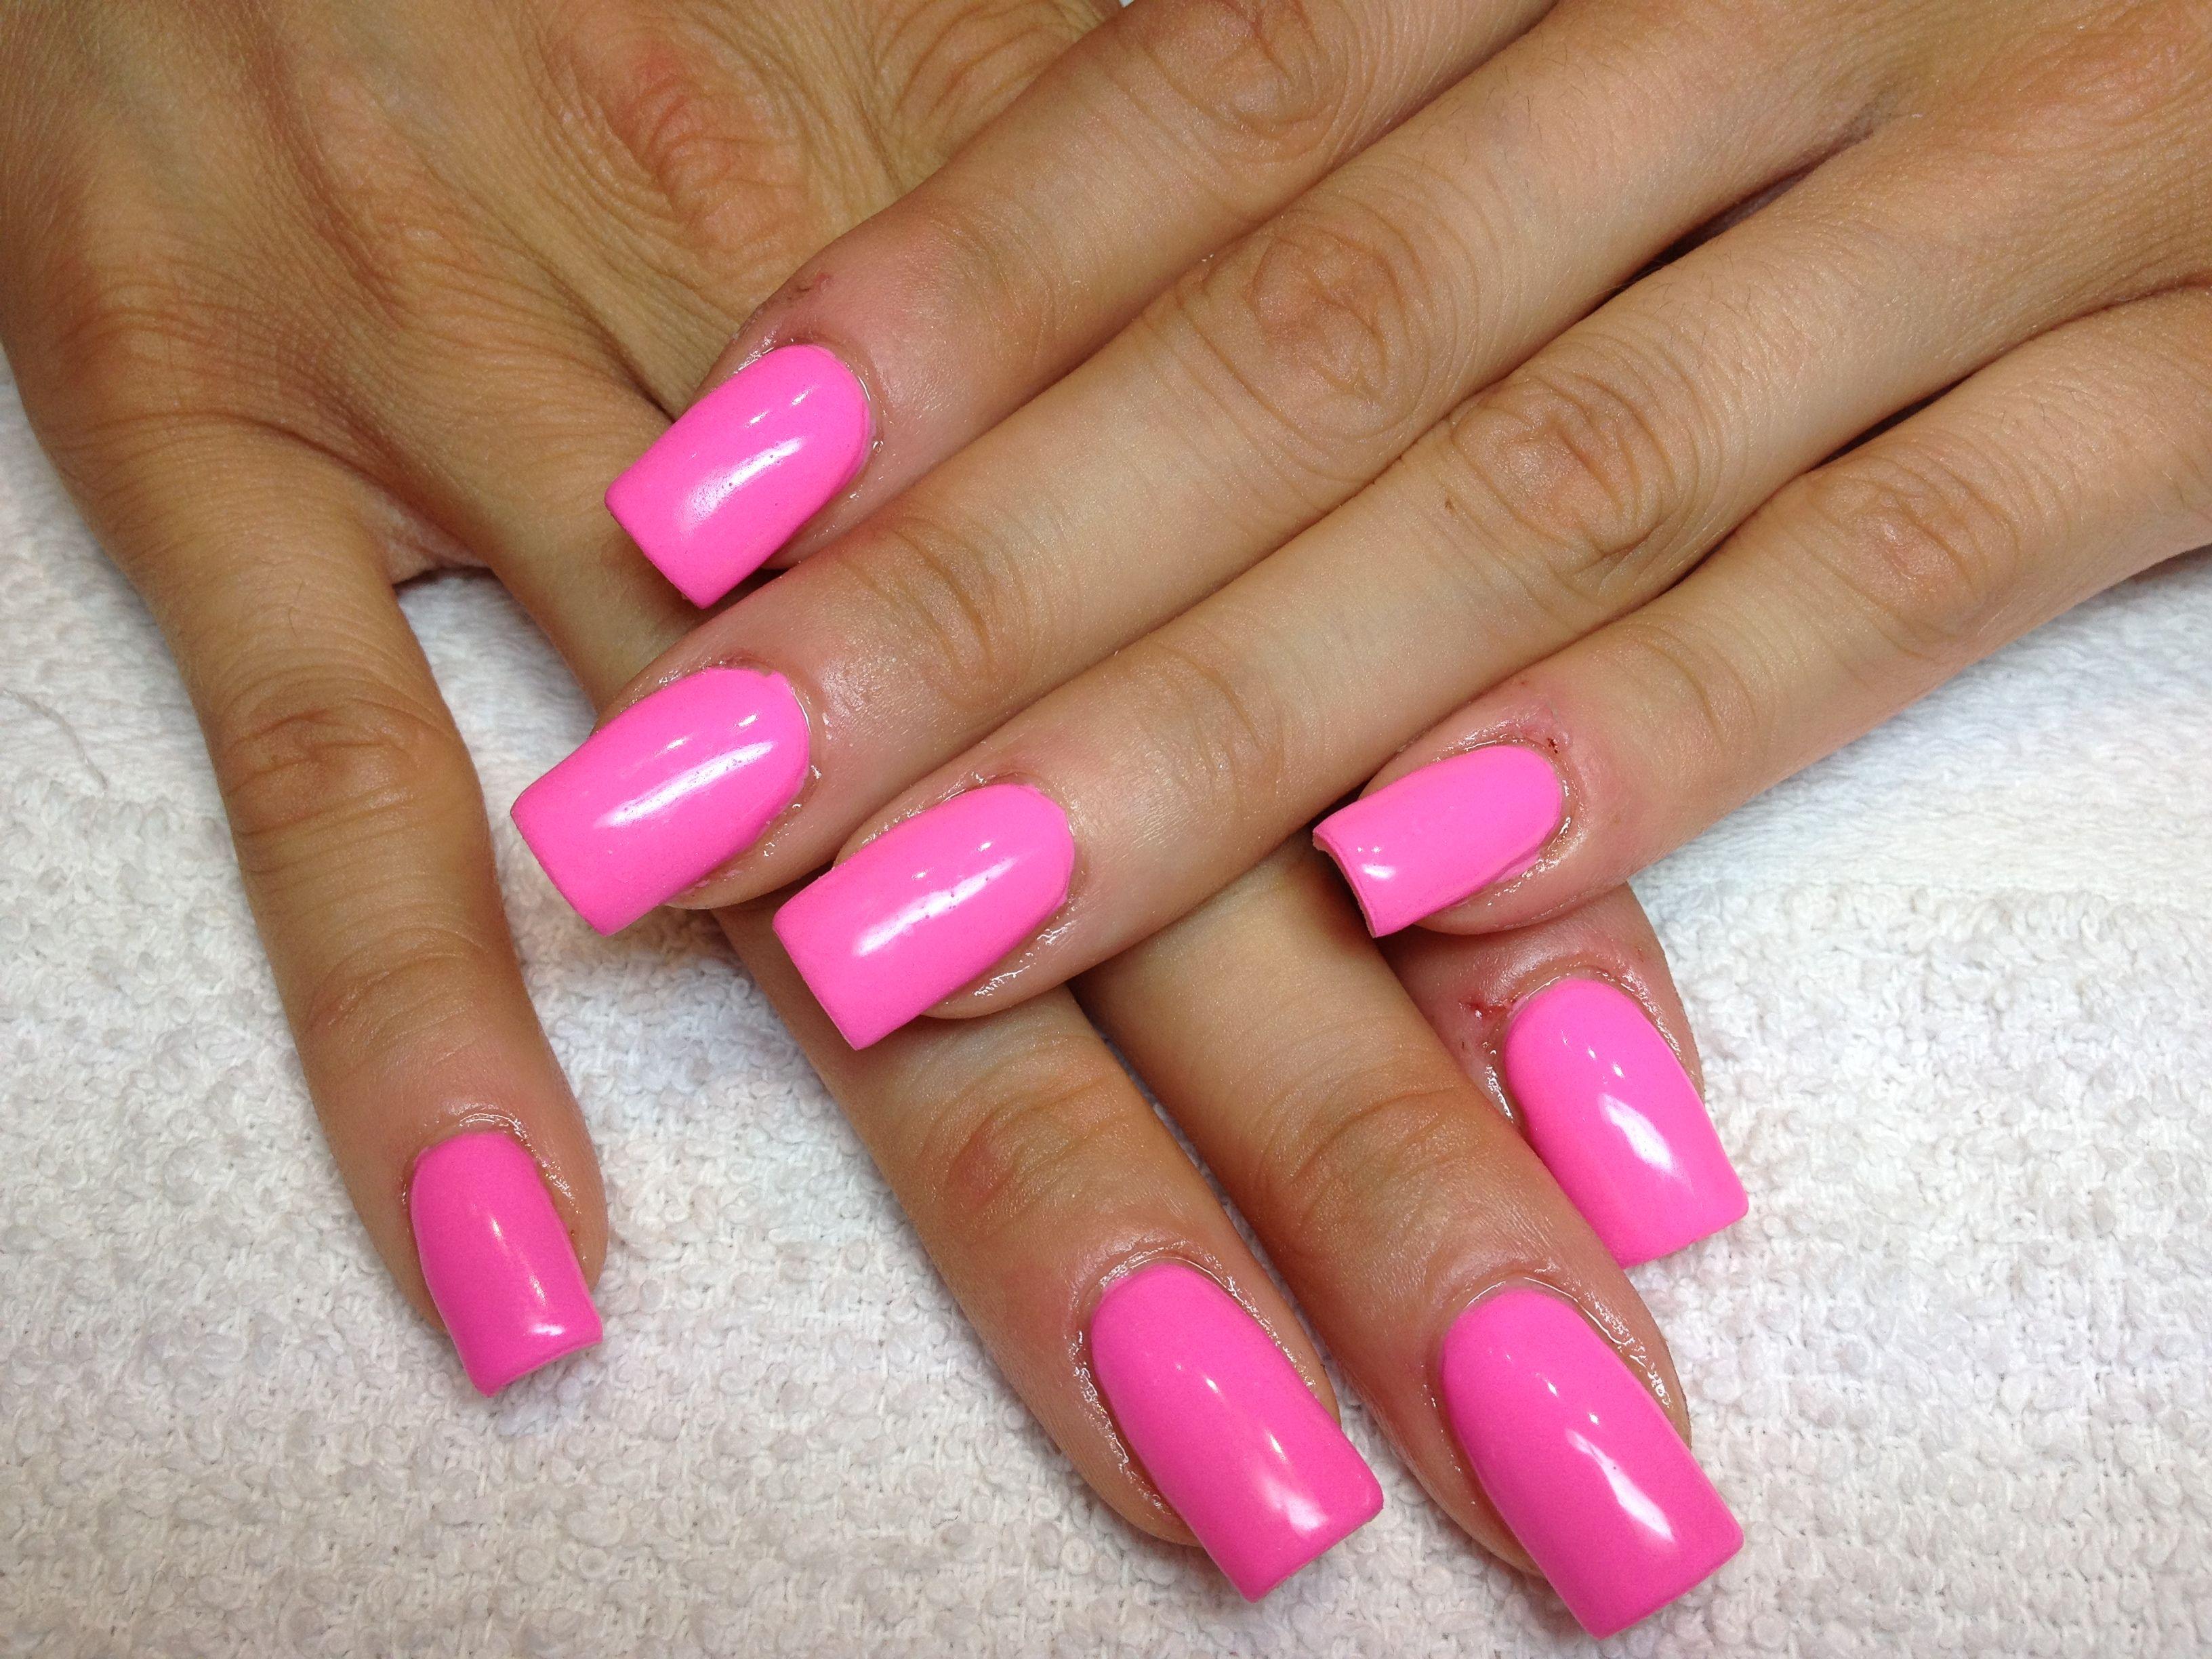 Barbie pink gel nails | nails | Pink gel nails, Barbie ...